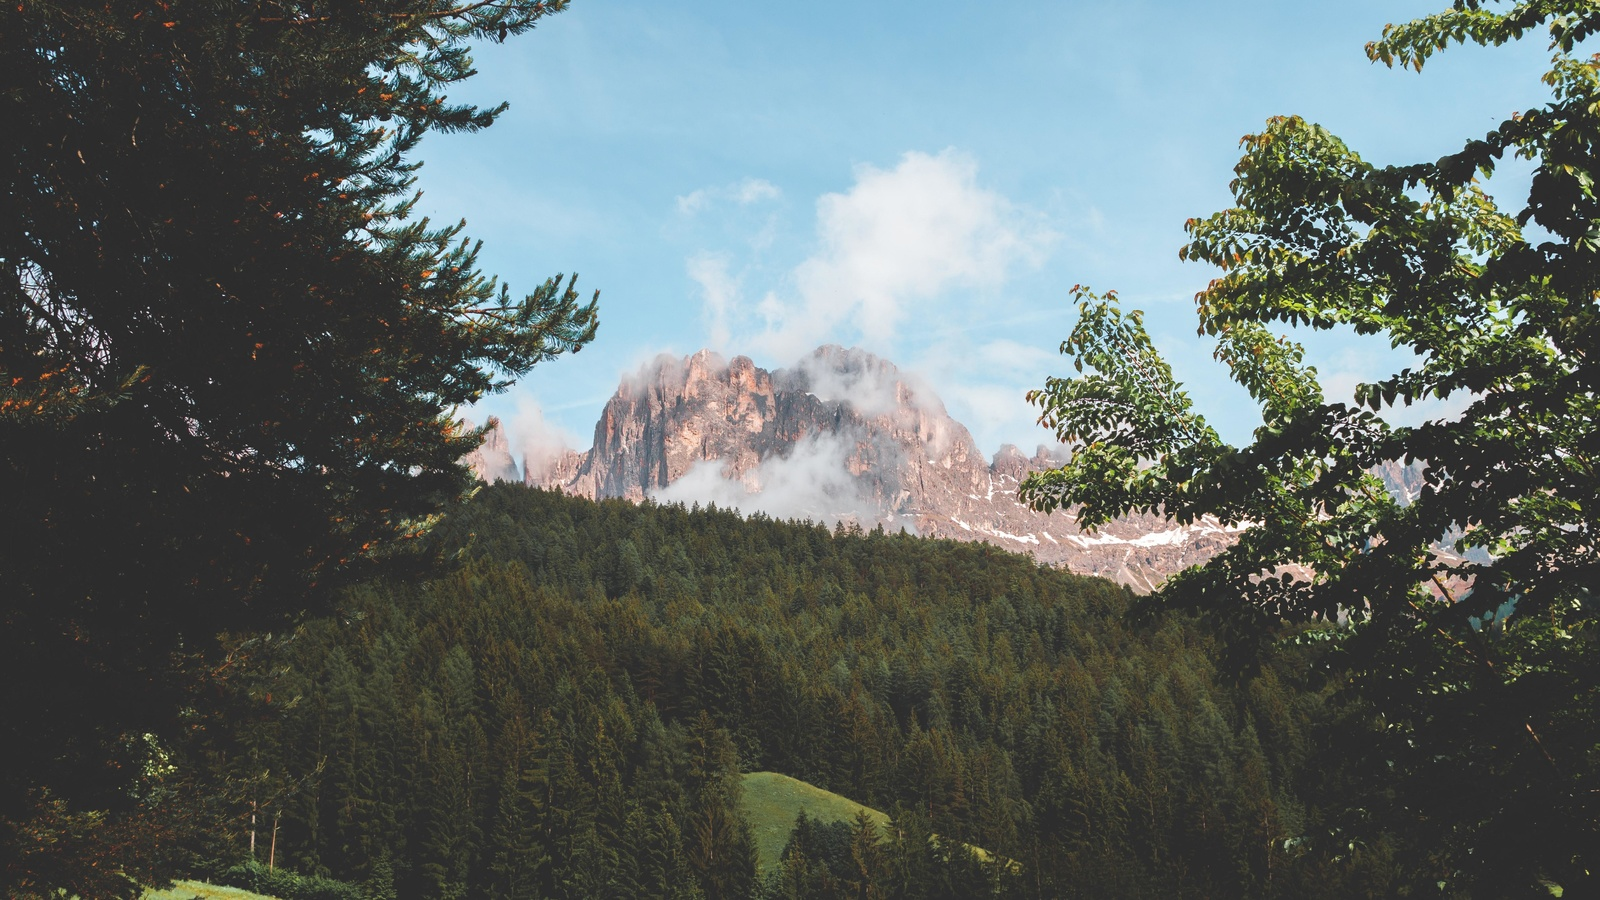 гора, туман, ветки, лес